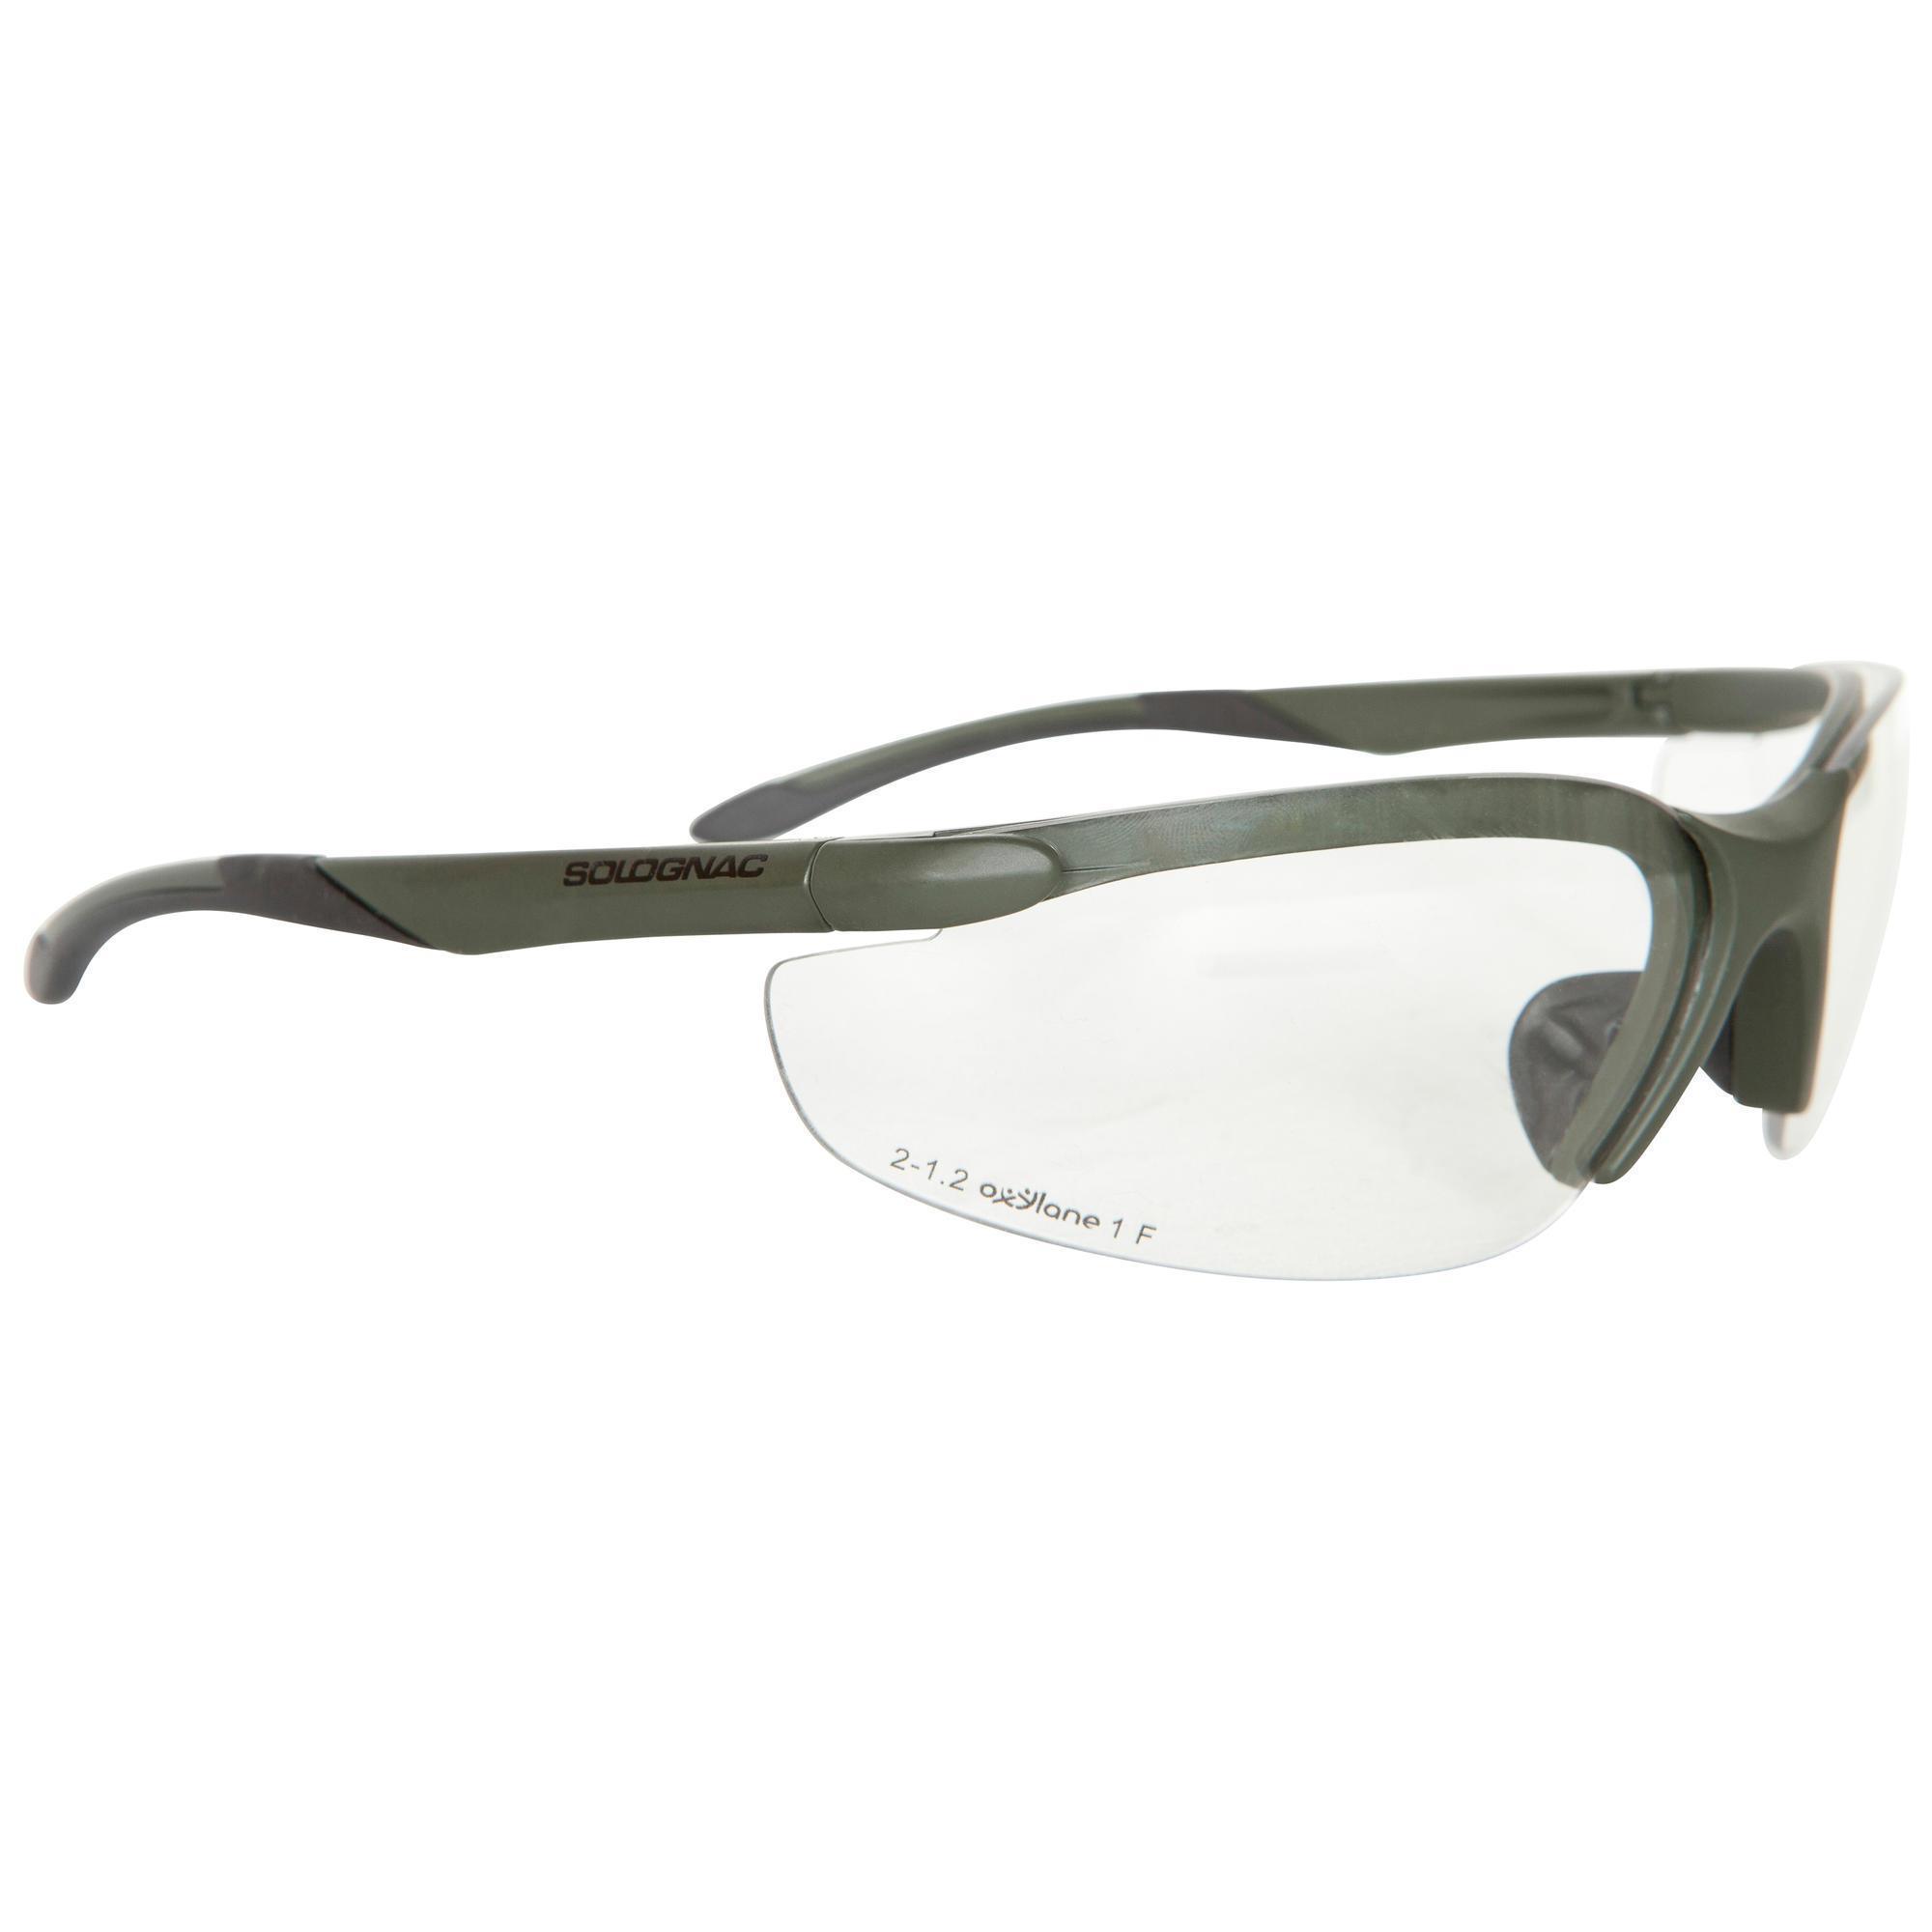 lunettes chasse protection neutre vert solognac. Black Bedroom Furniture Sets. Home Design Ideas